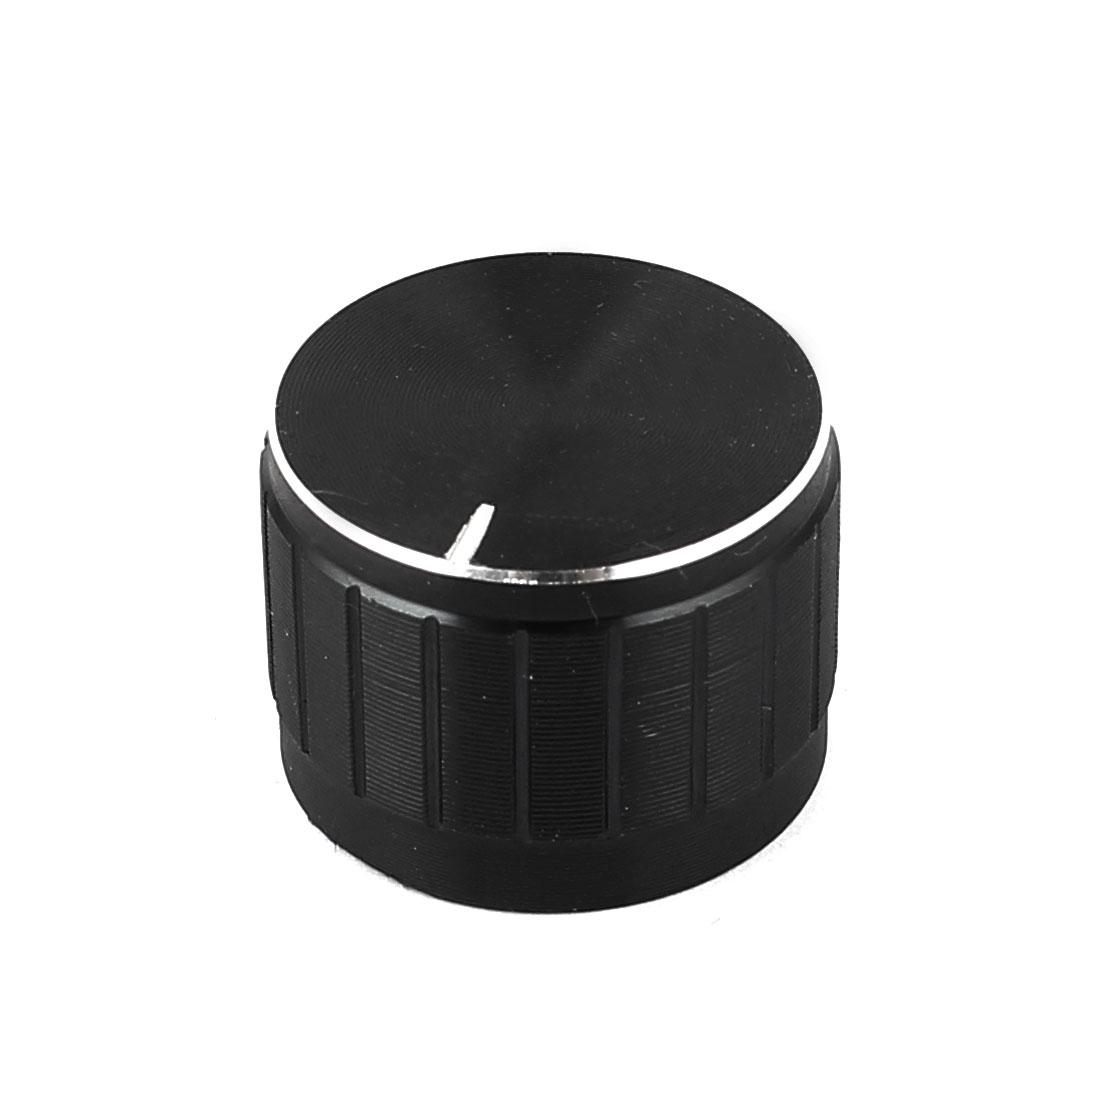 6mm Dia Shaft Metal Shell Potentiometer Pot Rotary Control Knob